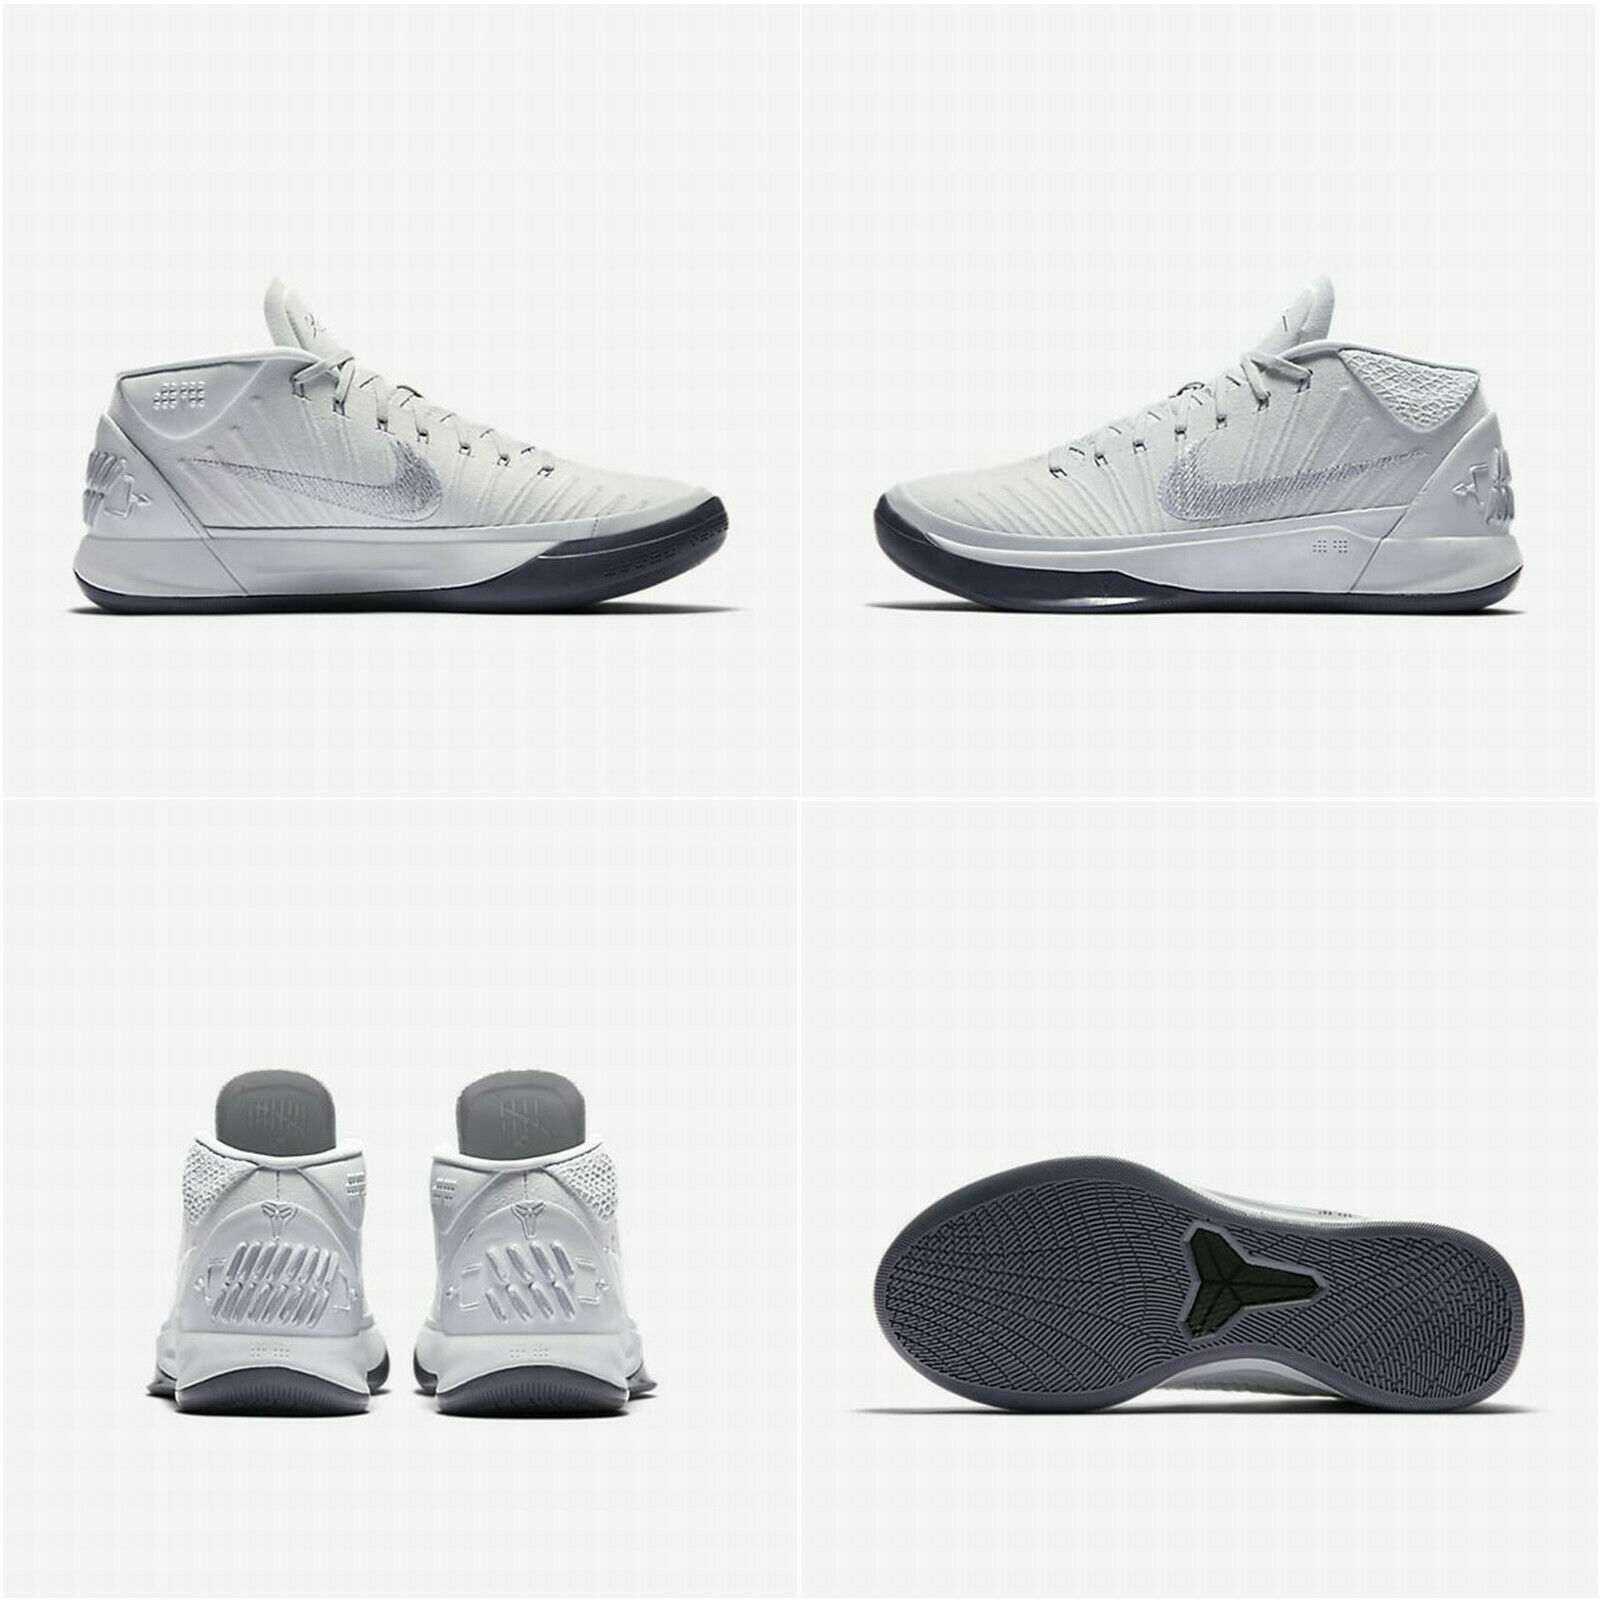 on sale a7397 92cce Nike Kobe AD Mens Basketball Shoes 11.5 Pure Platinum 922482 004